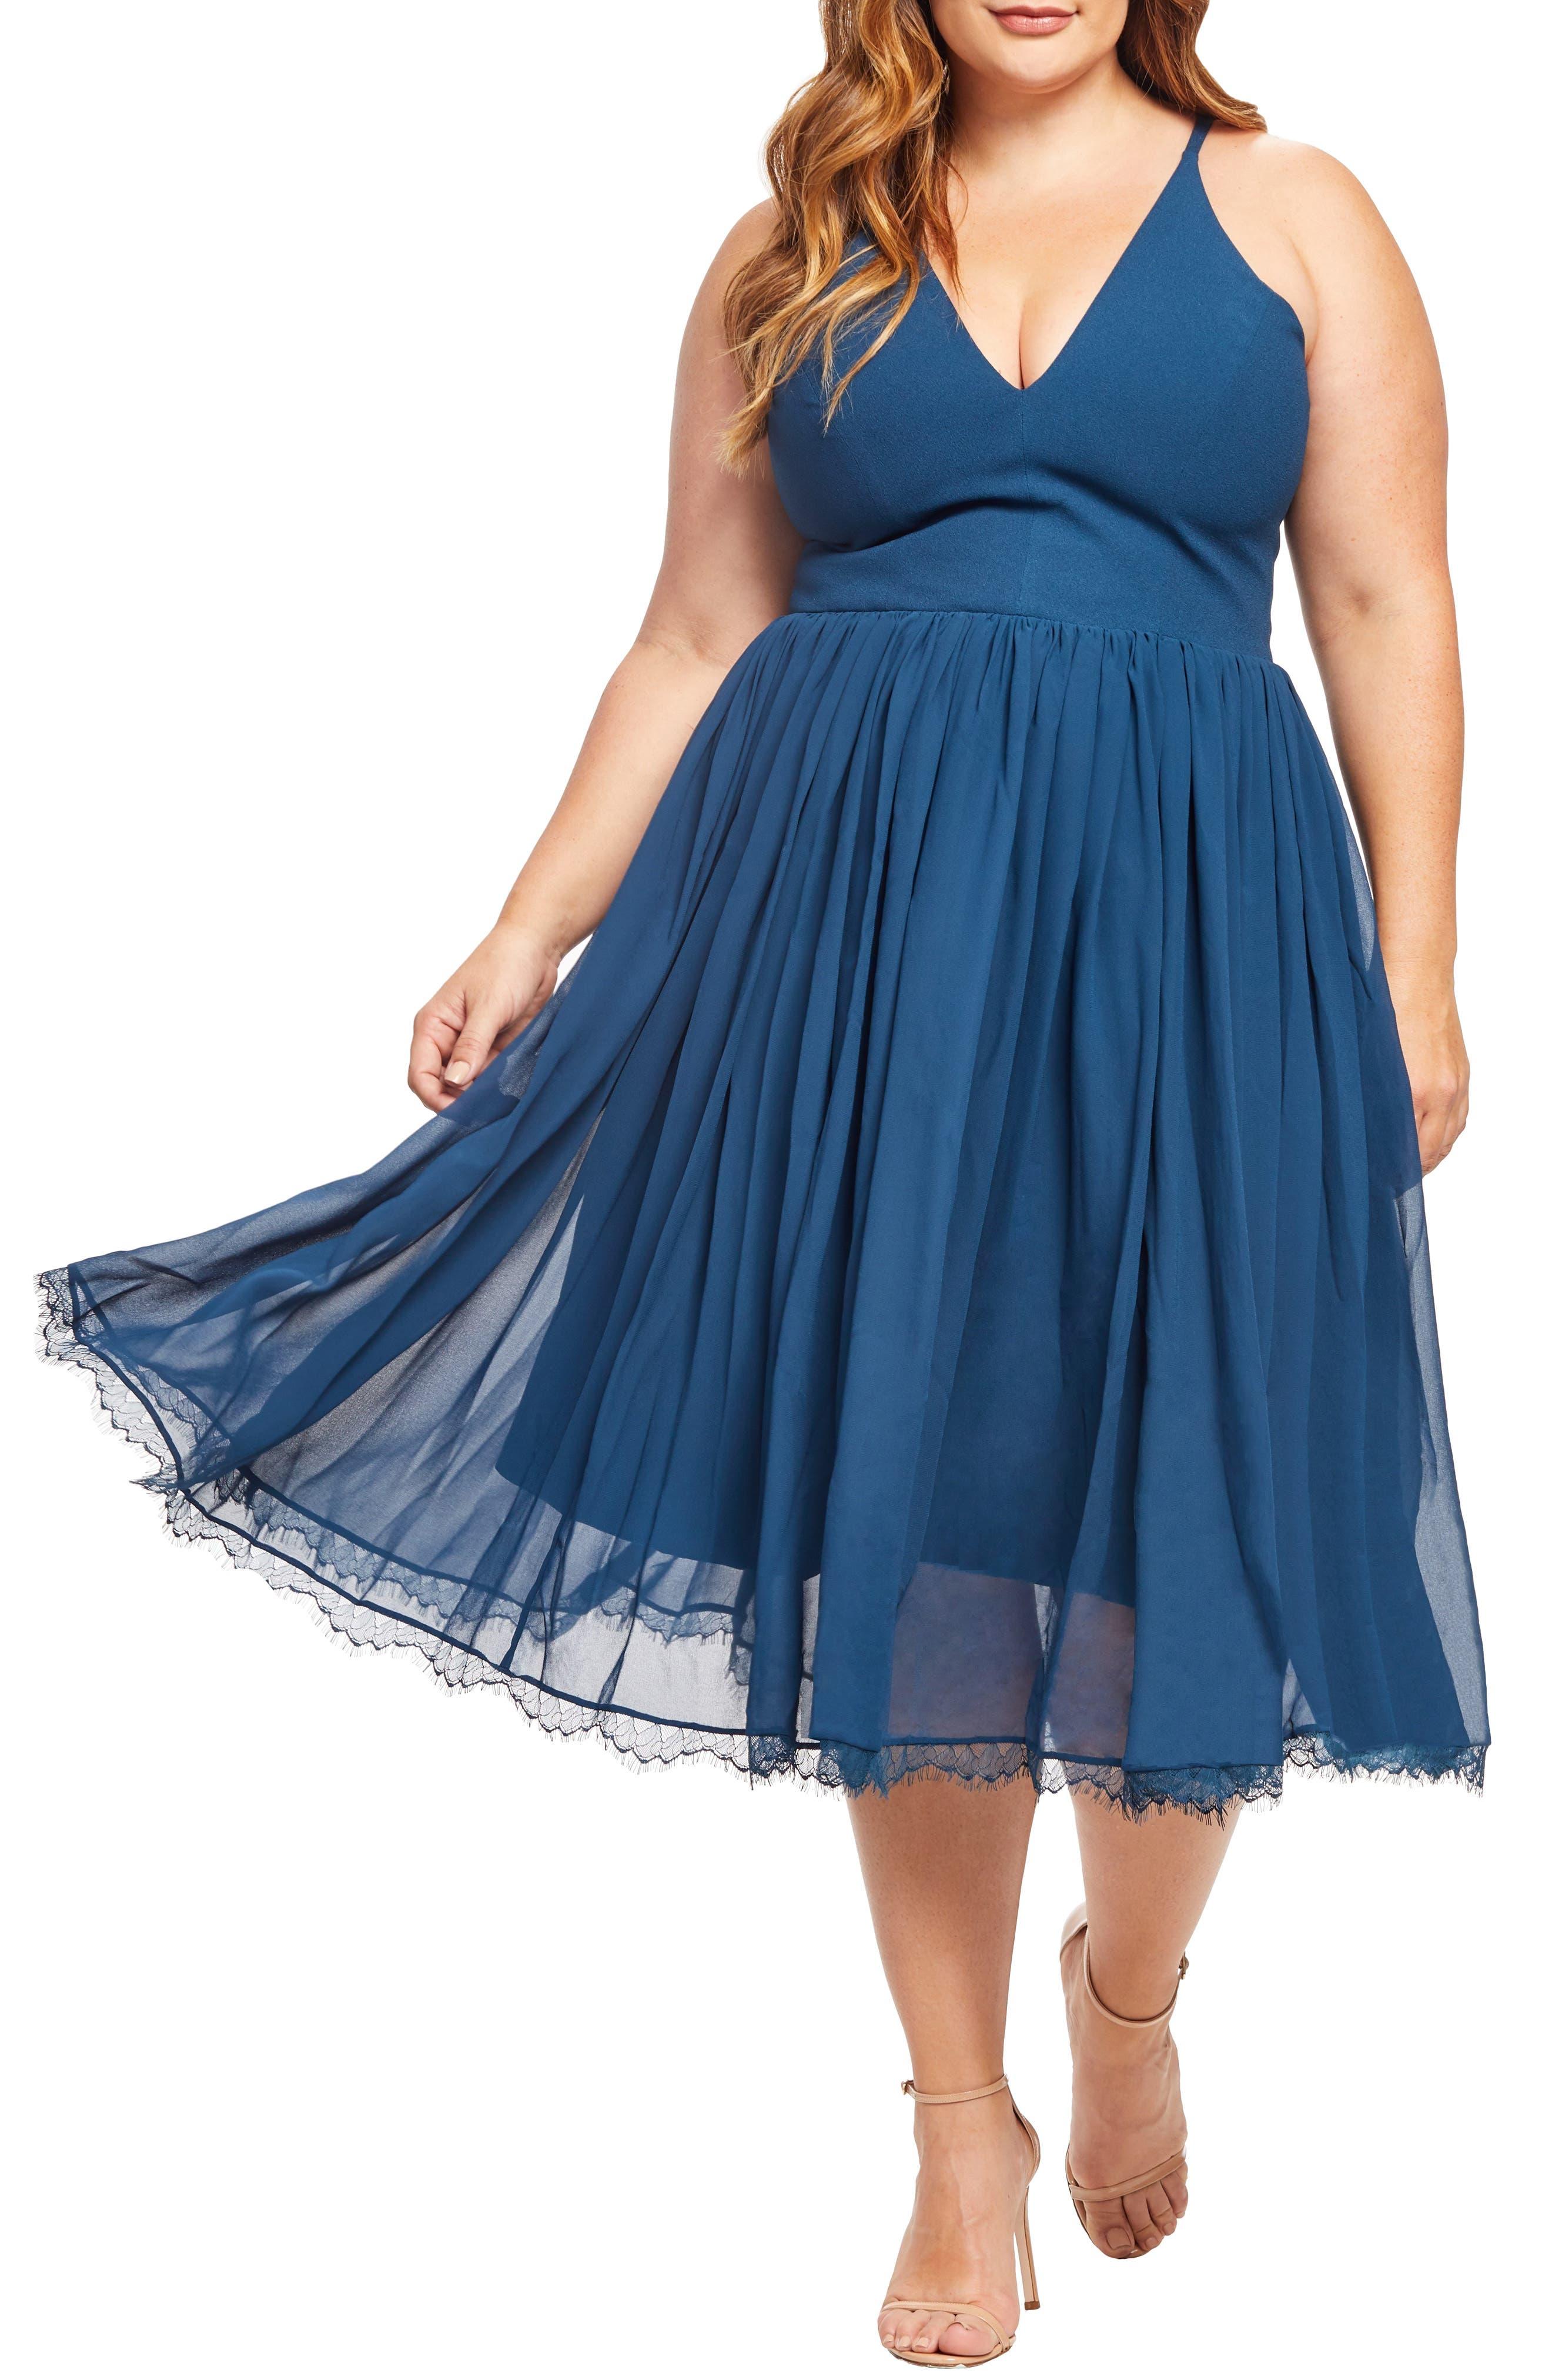 Alicia Mixed Media Midi Dress,                             Main thumbnail 1, color,                             PEACOCK BLUE